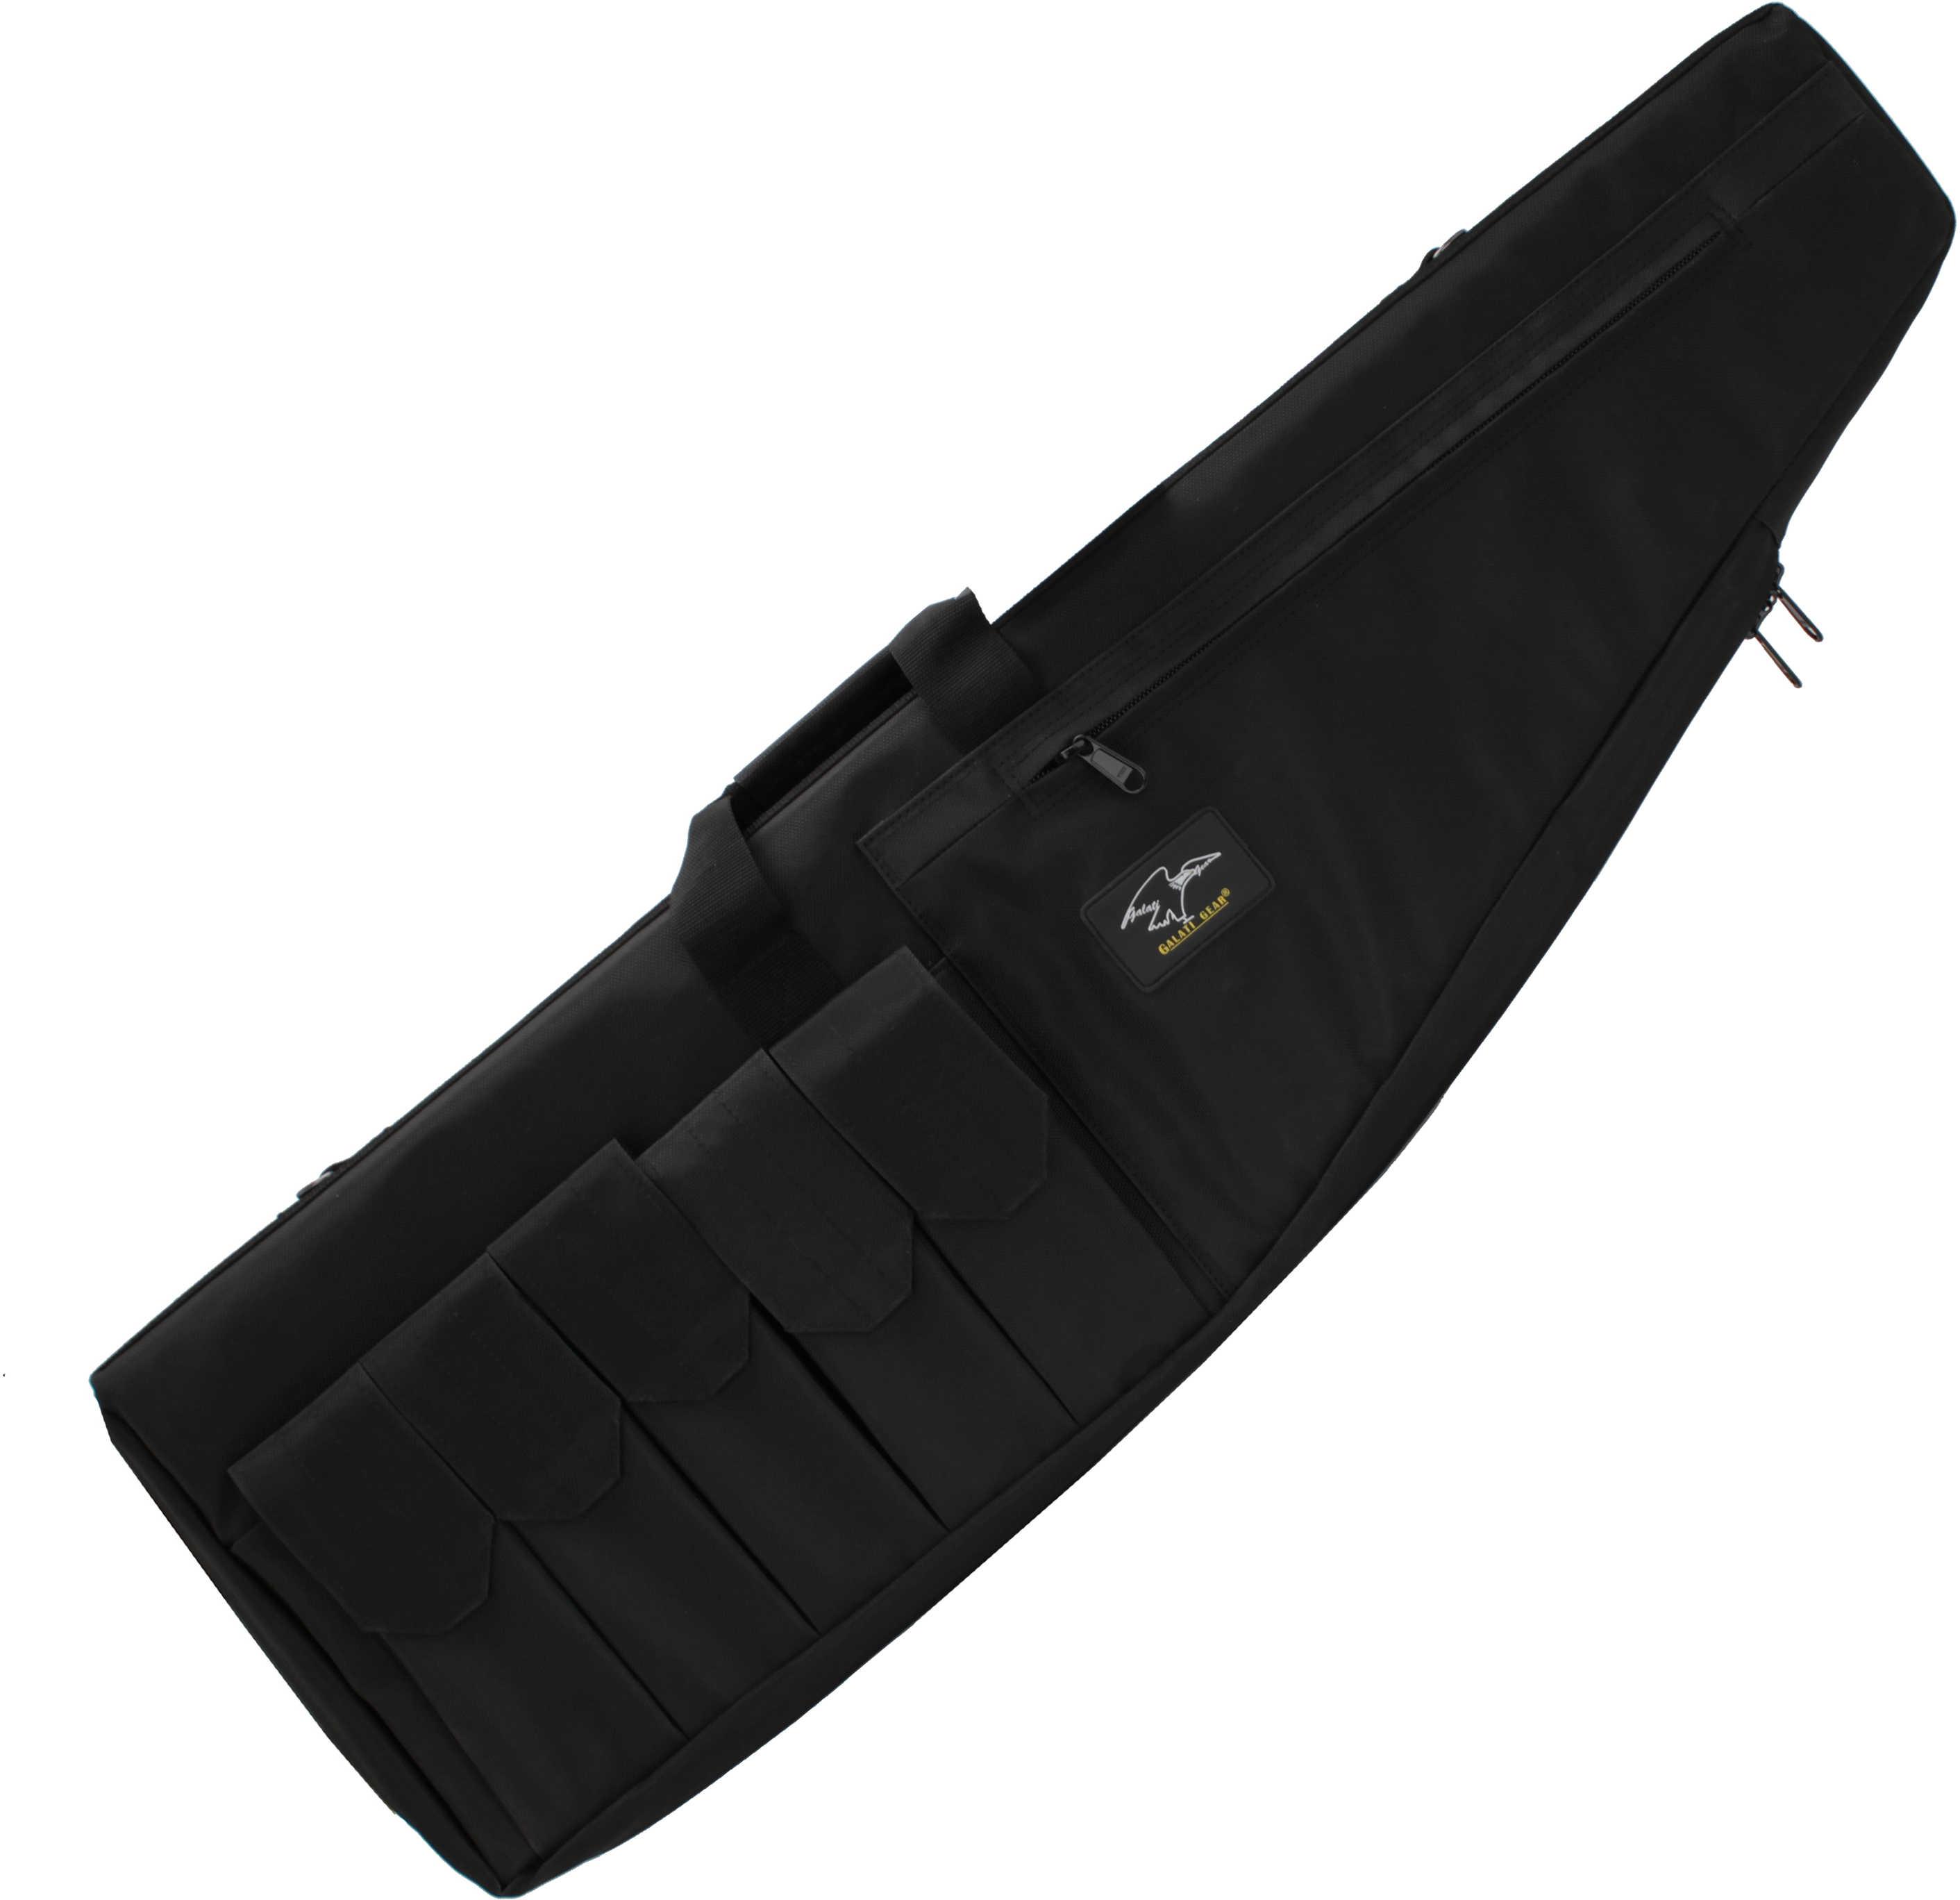 "Galati Gear Rifle Rifle Case Black Nylon 42"" X 12"" X 2.5"" 4208XT"